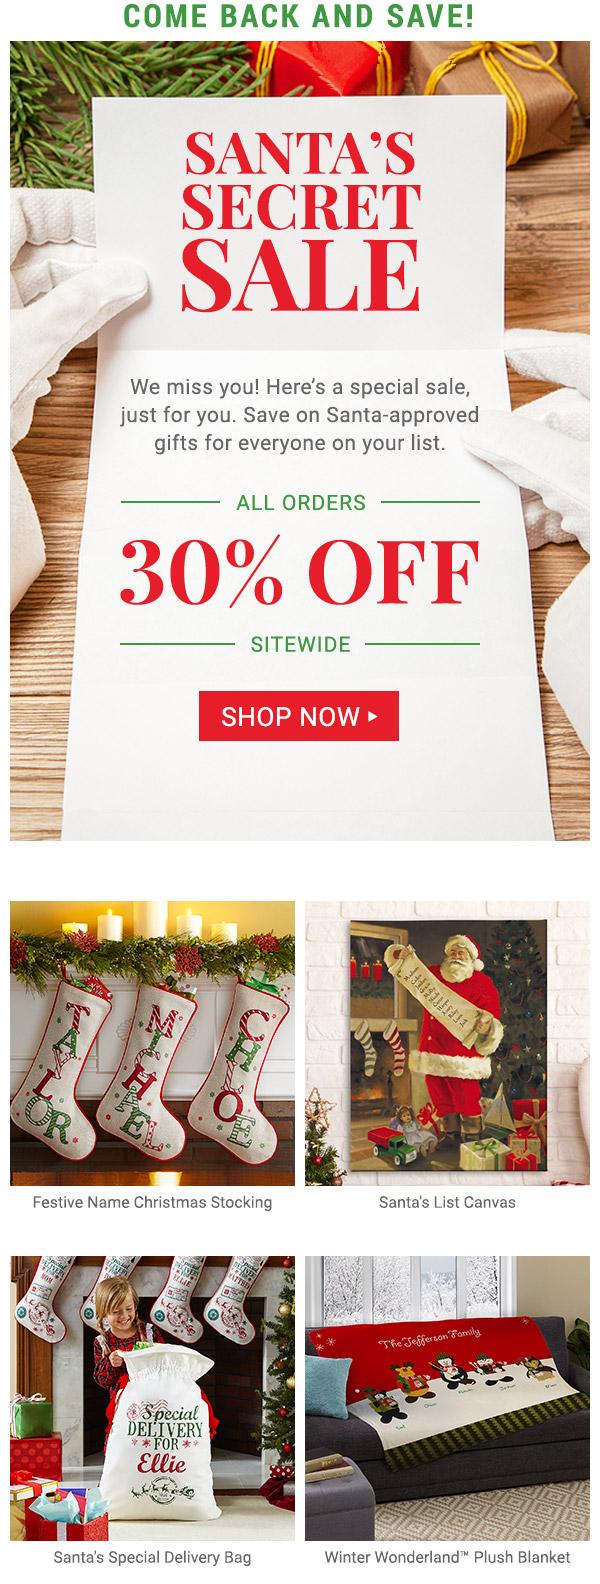 Santa's Secret Sale! Save 30% off today only.